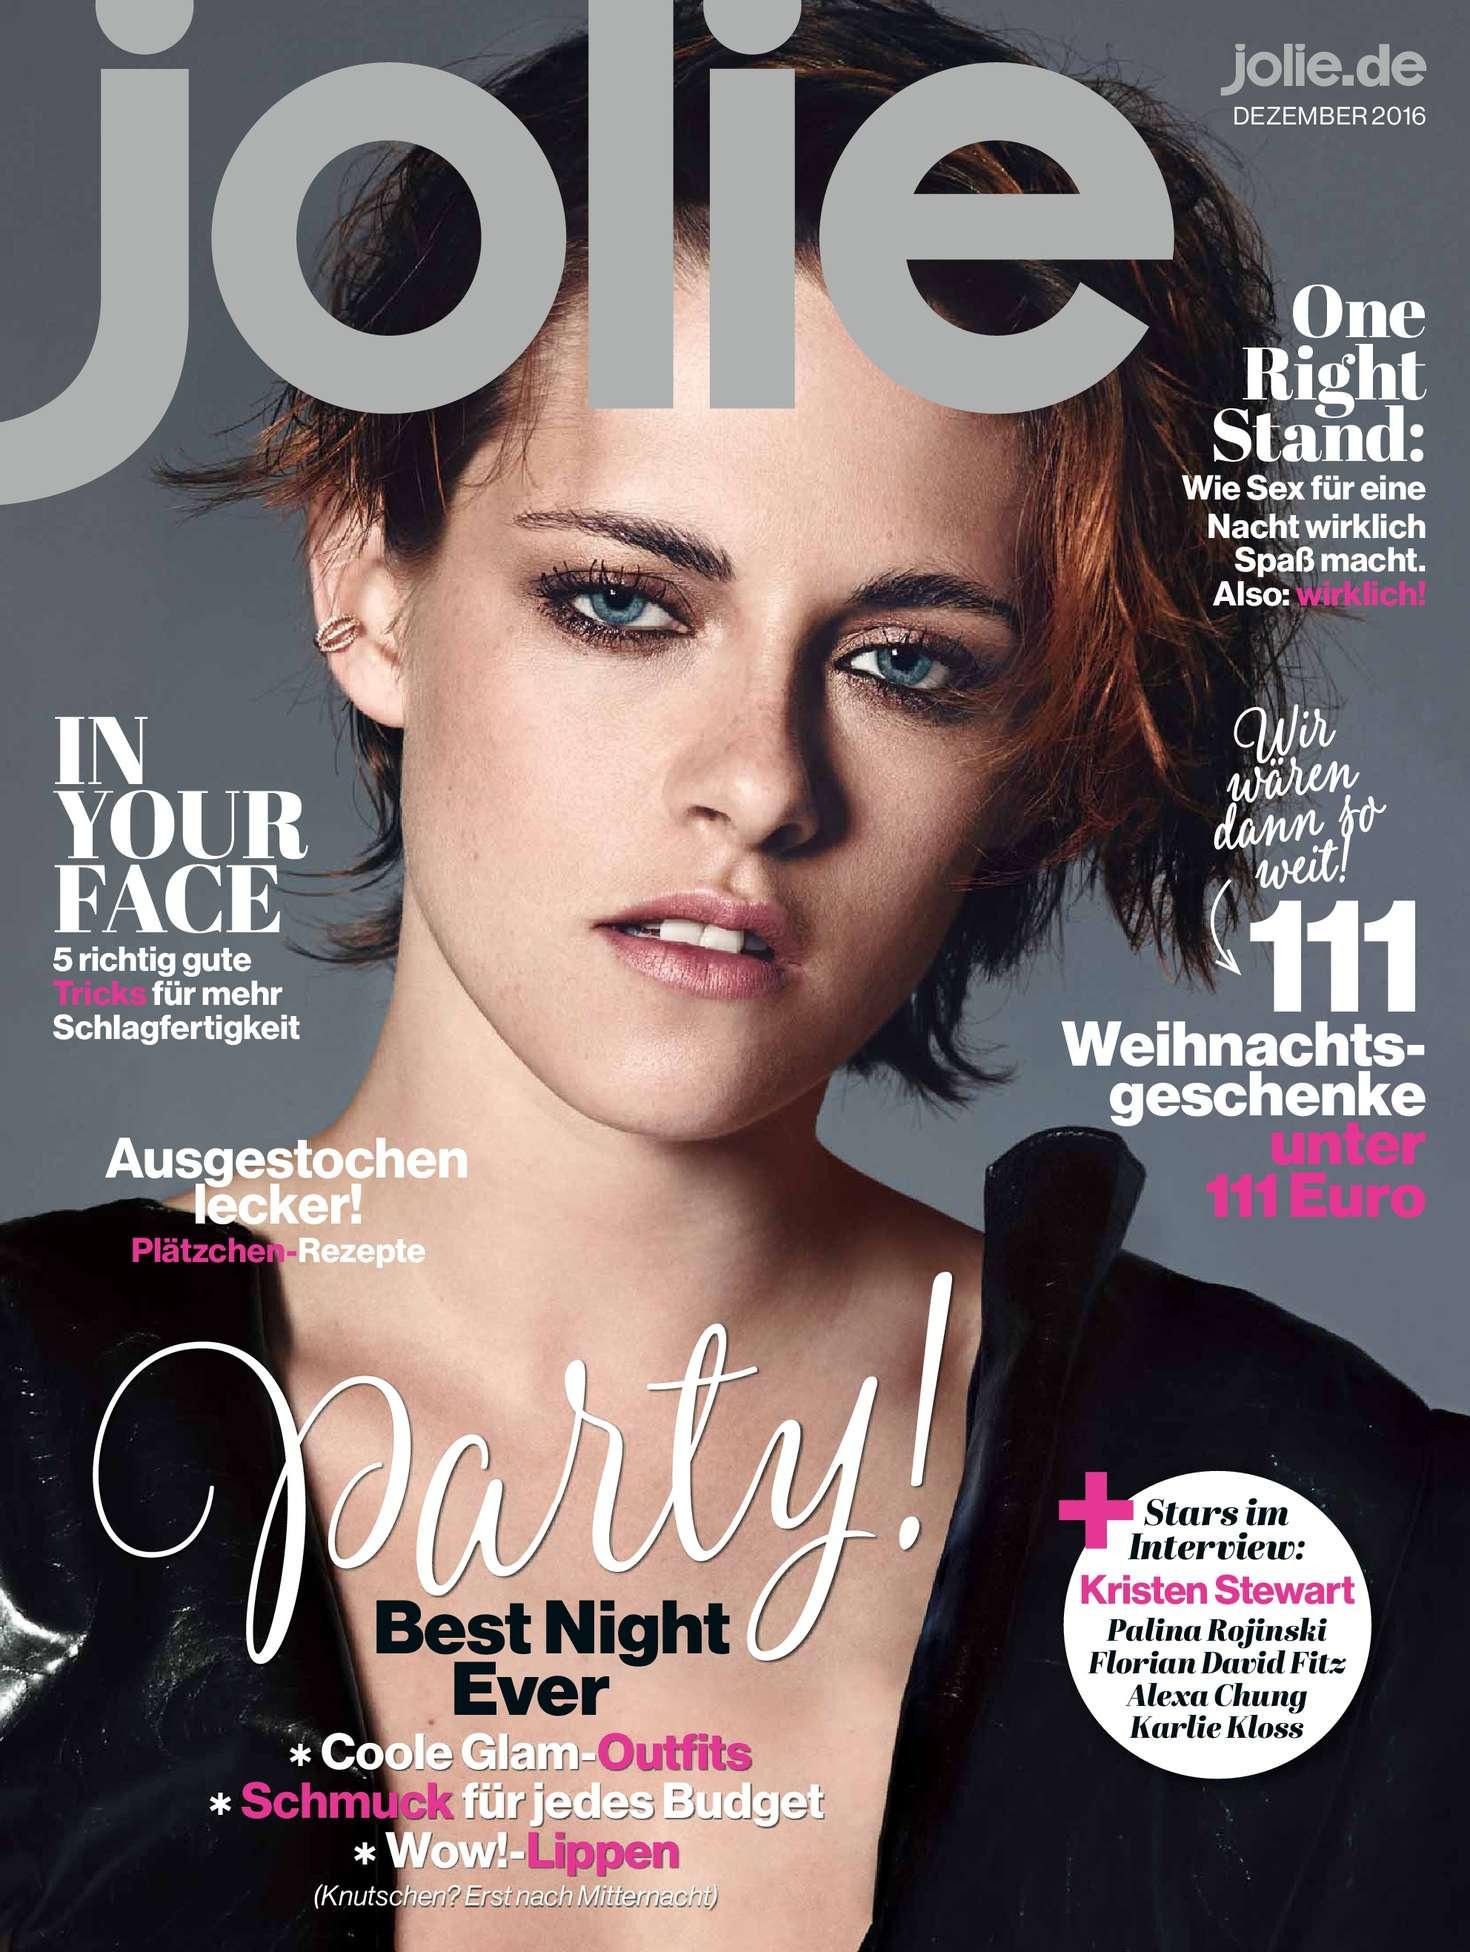 Jolie Magazine November 2017 Issue: Jolie Magazine (December 2016